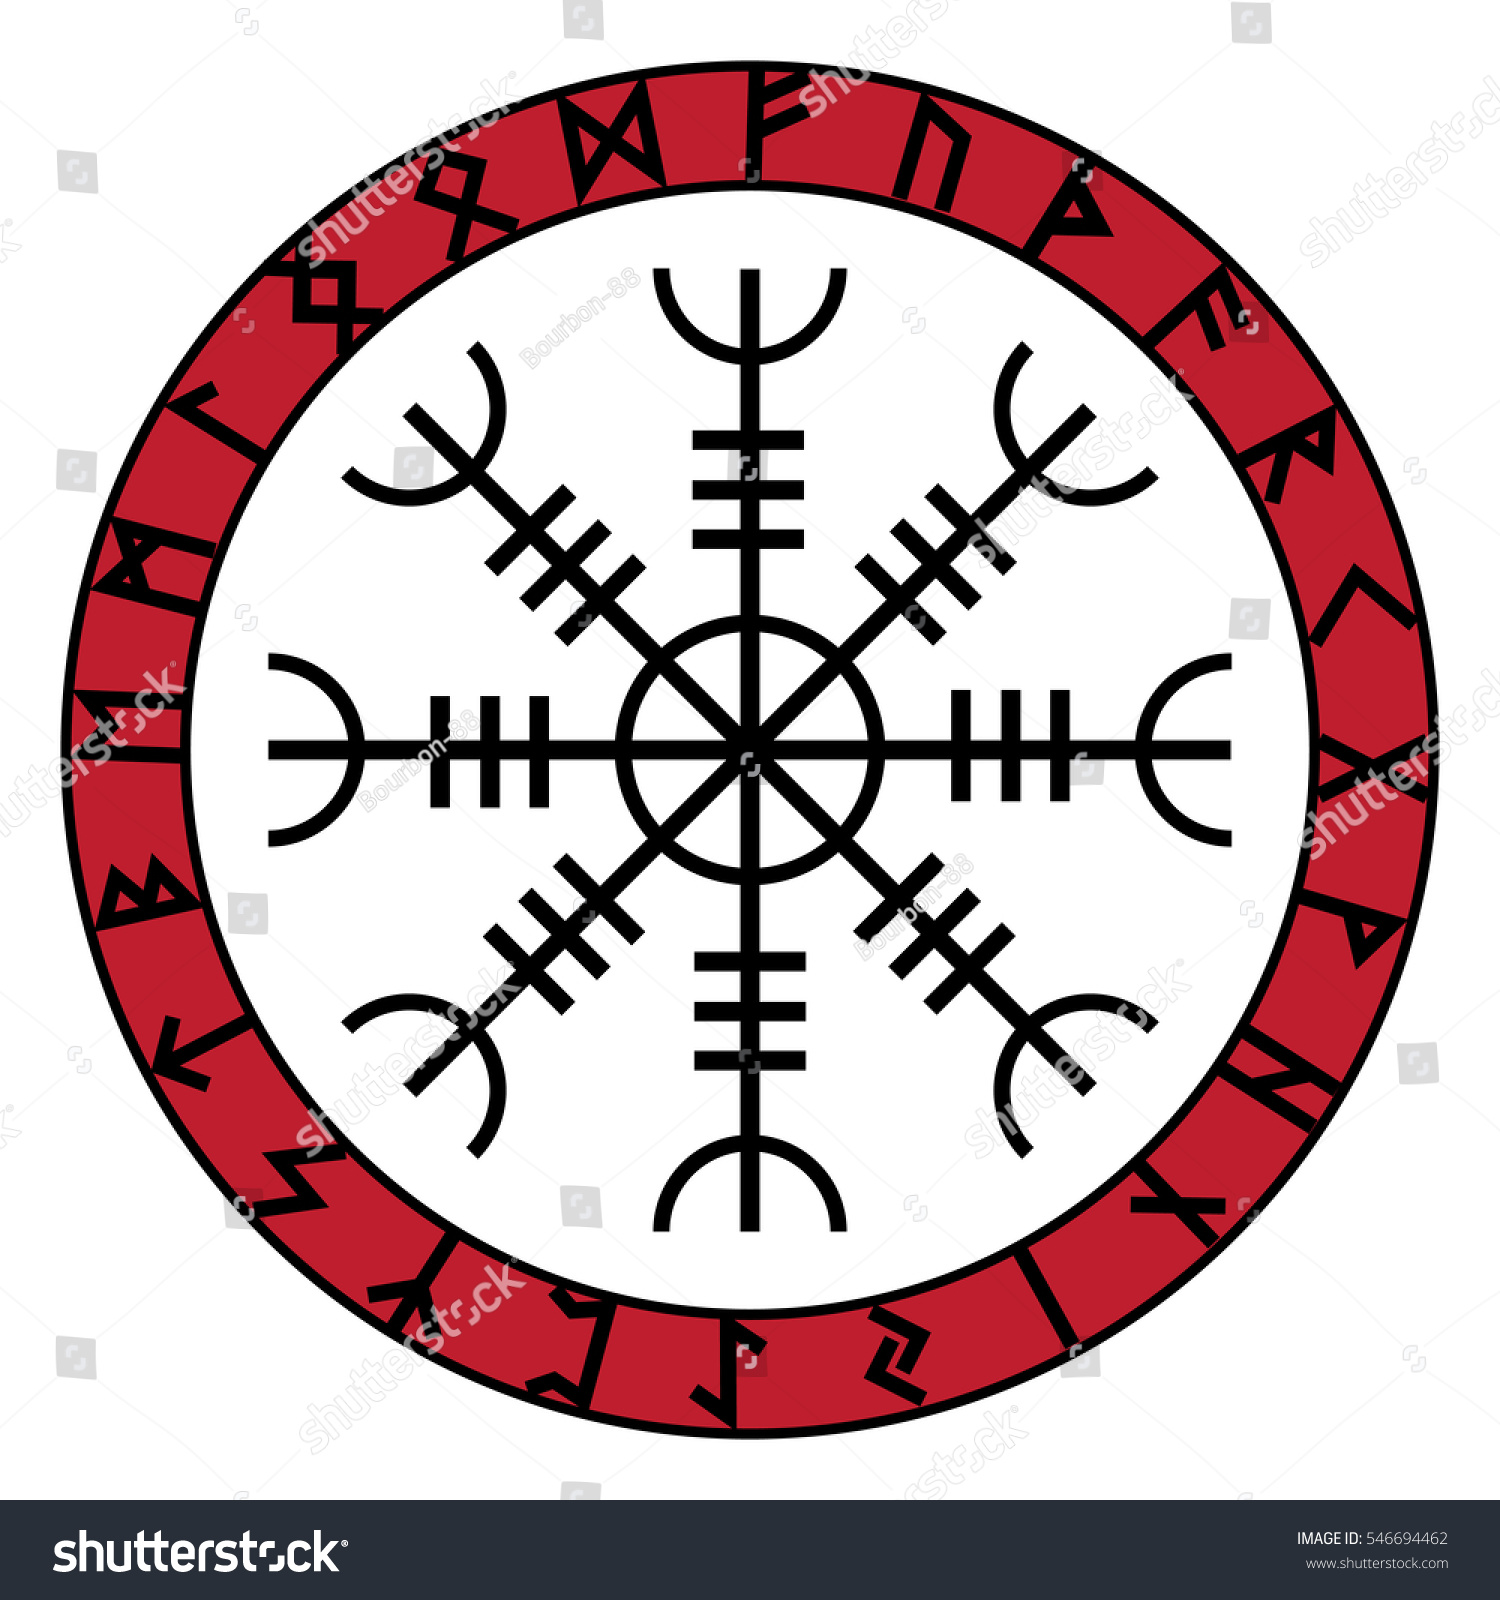 Aegishjalmur Helm Of Awe Helm Of Terror Icelandic Magical Staves